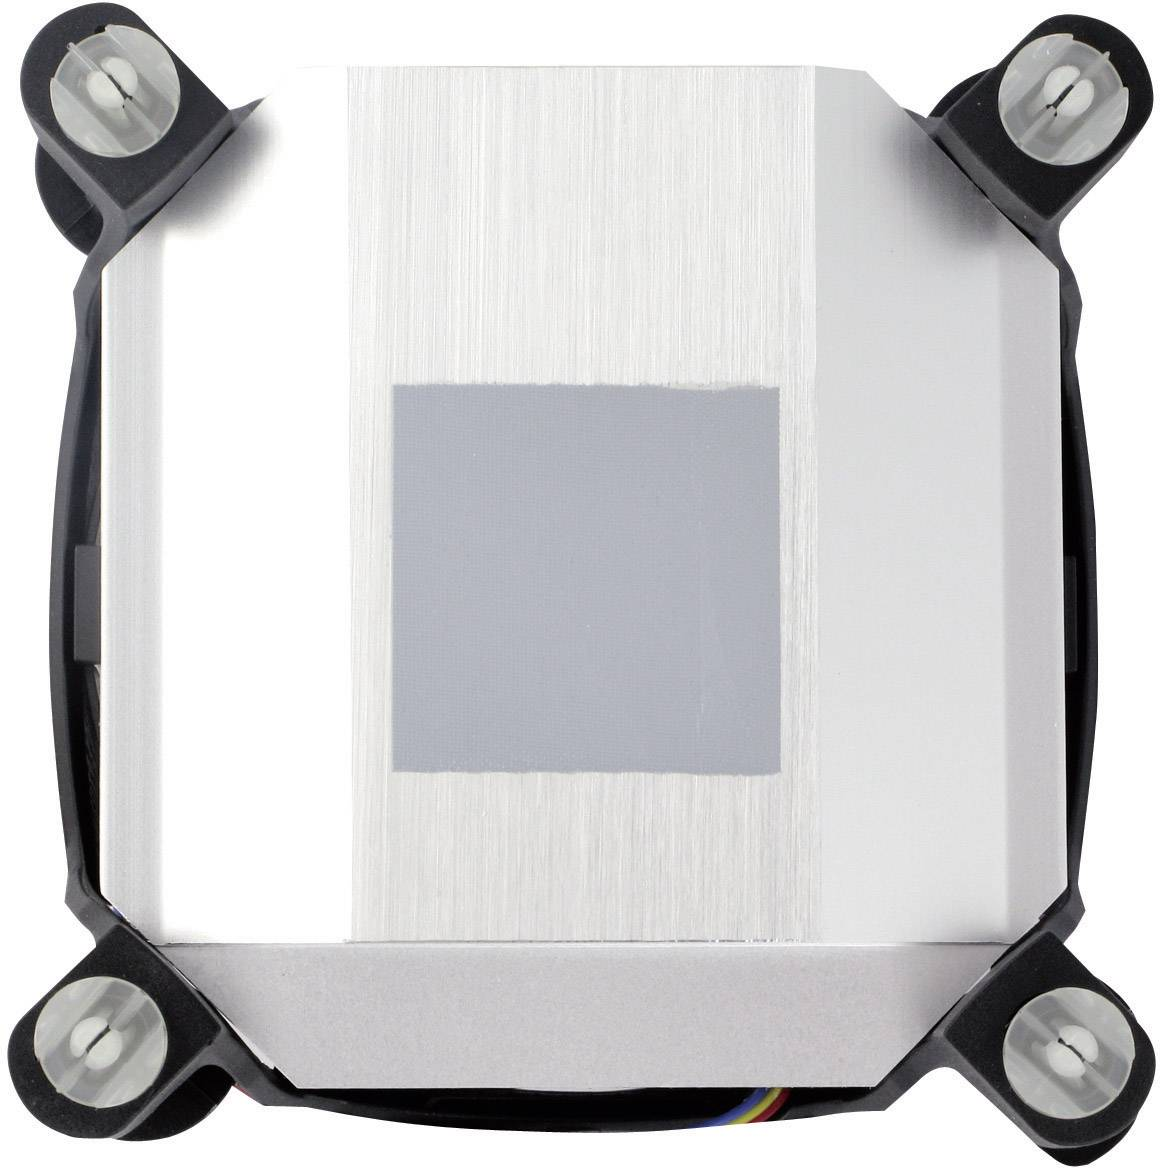 Chladič na procesor, Arctic Alpine 11 GT